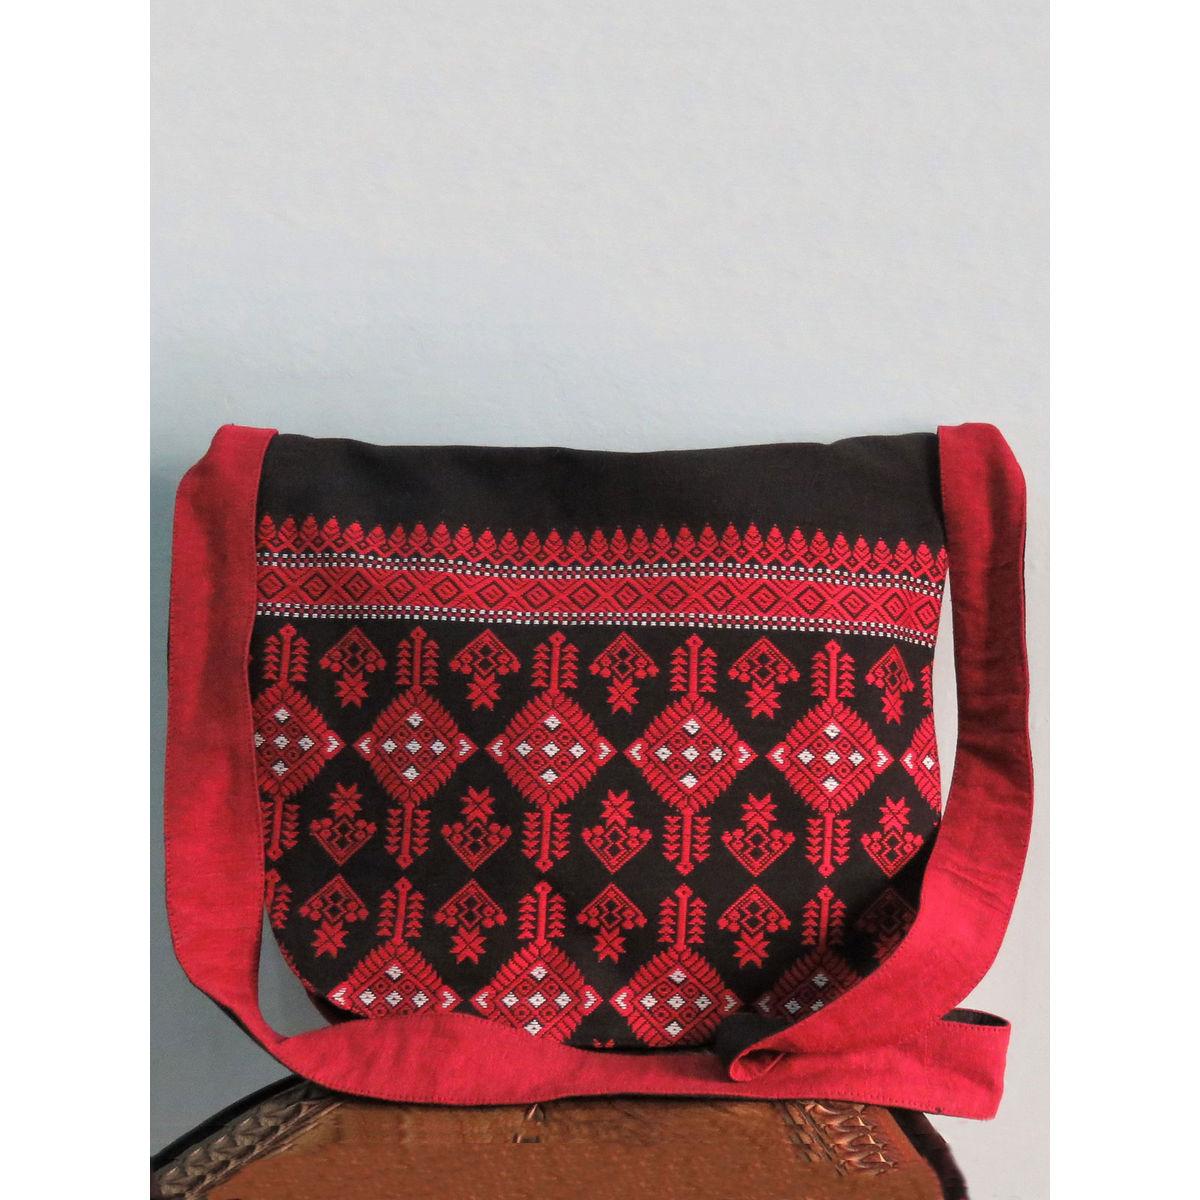 Black red messenger bag with handwoven design.